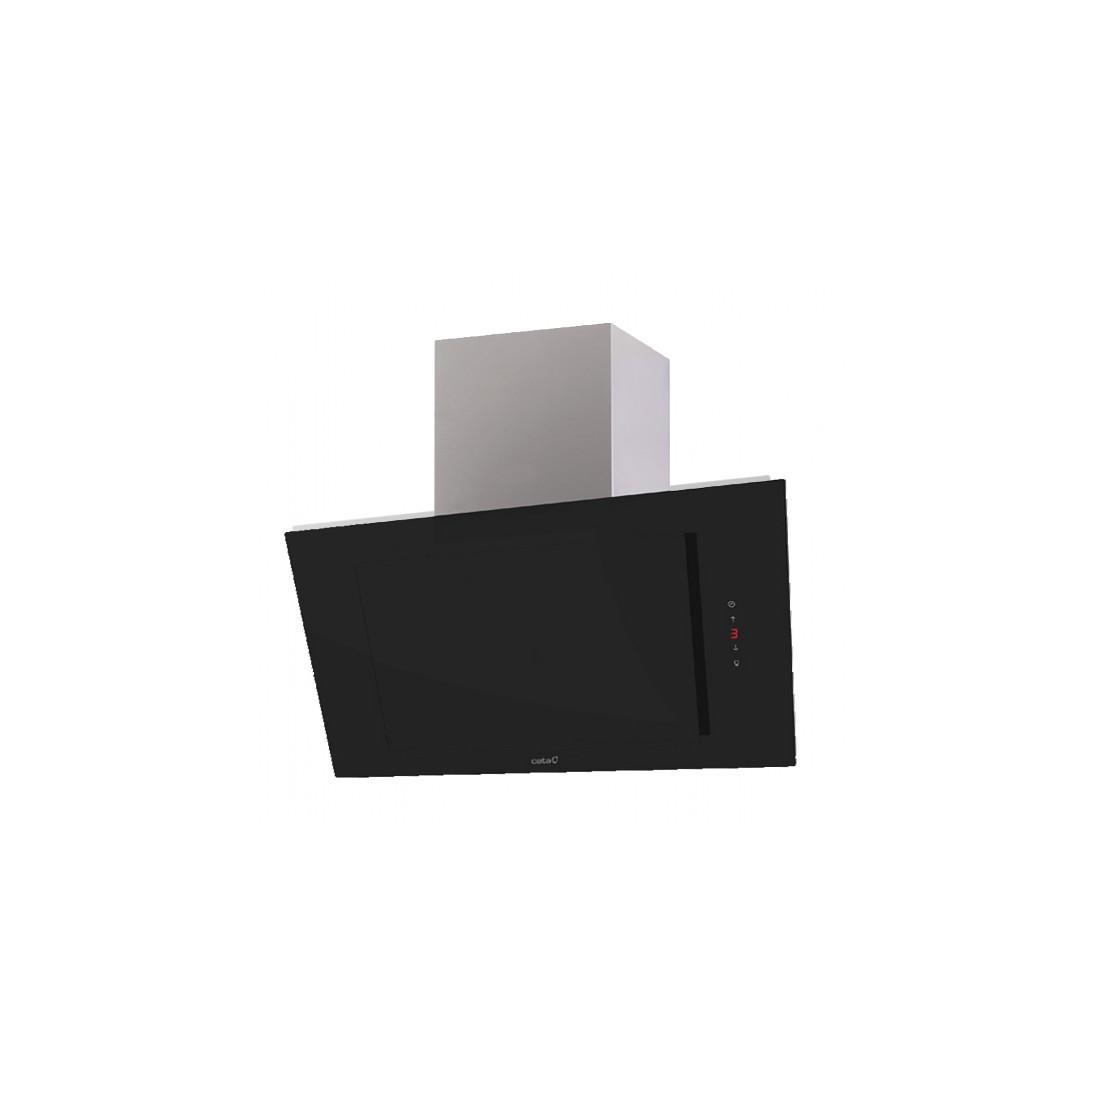 Campana Decorativa - Cata THALASSA 600XGBK Negro, 60 cm